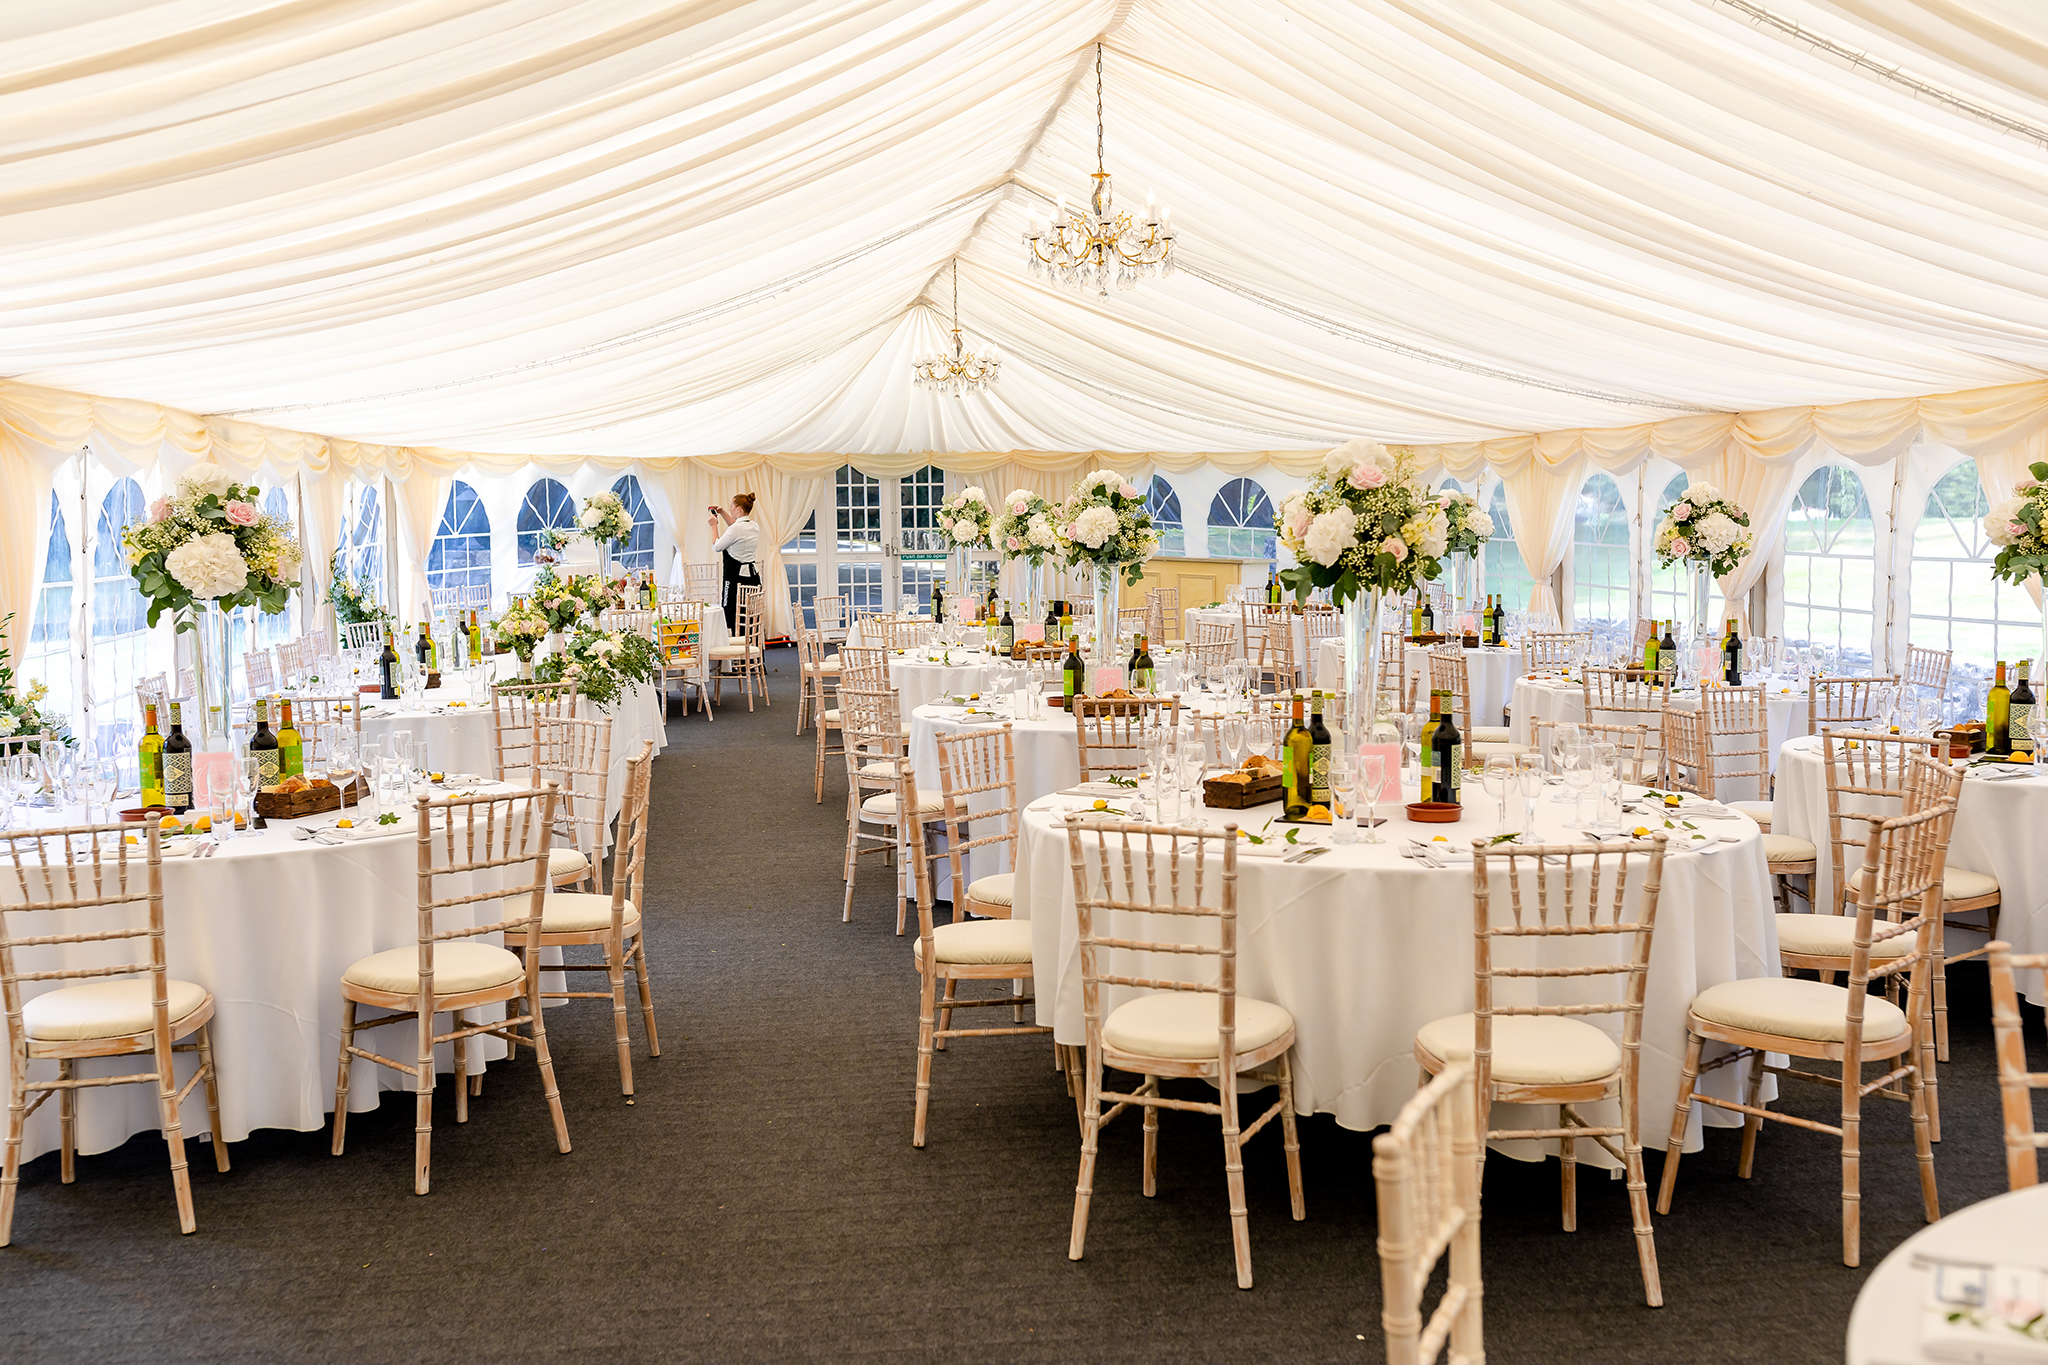 Fonmon castle wedding decorations and room